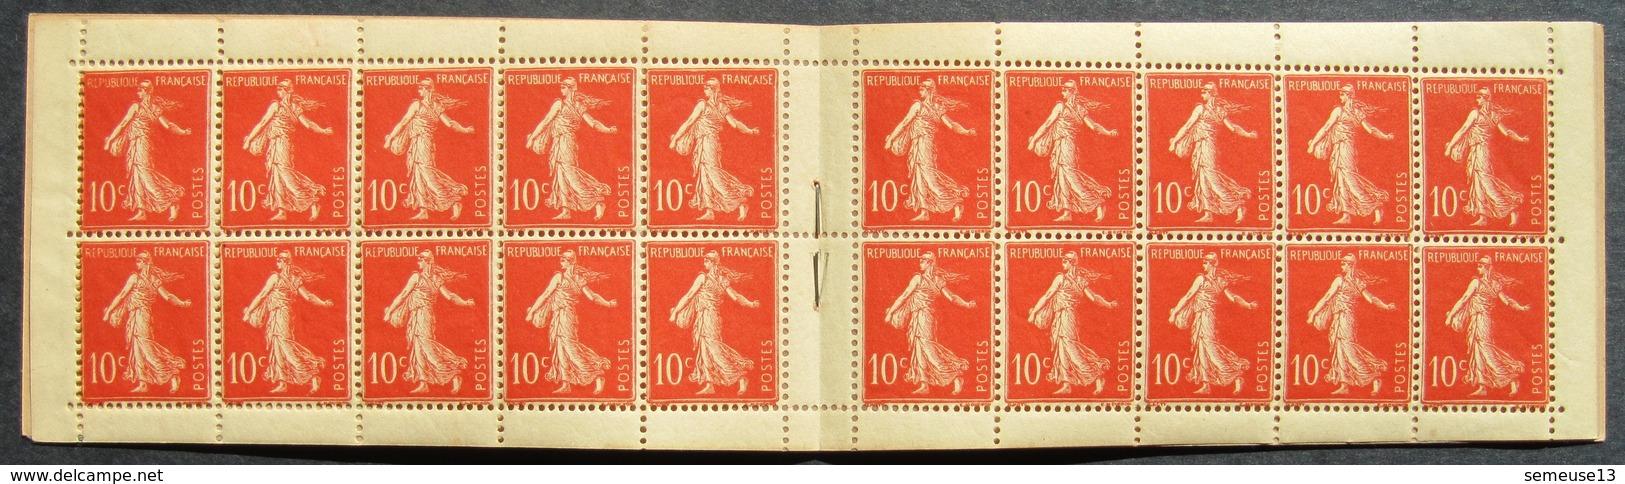 Semeuse 10 C. Maigre 135 Carnet C1 Superbe - Pas Cher - 1906-38 Semeuse Camée